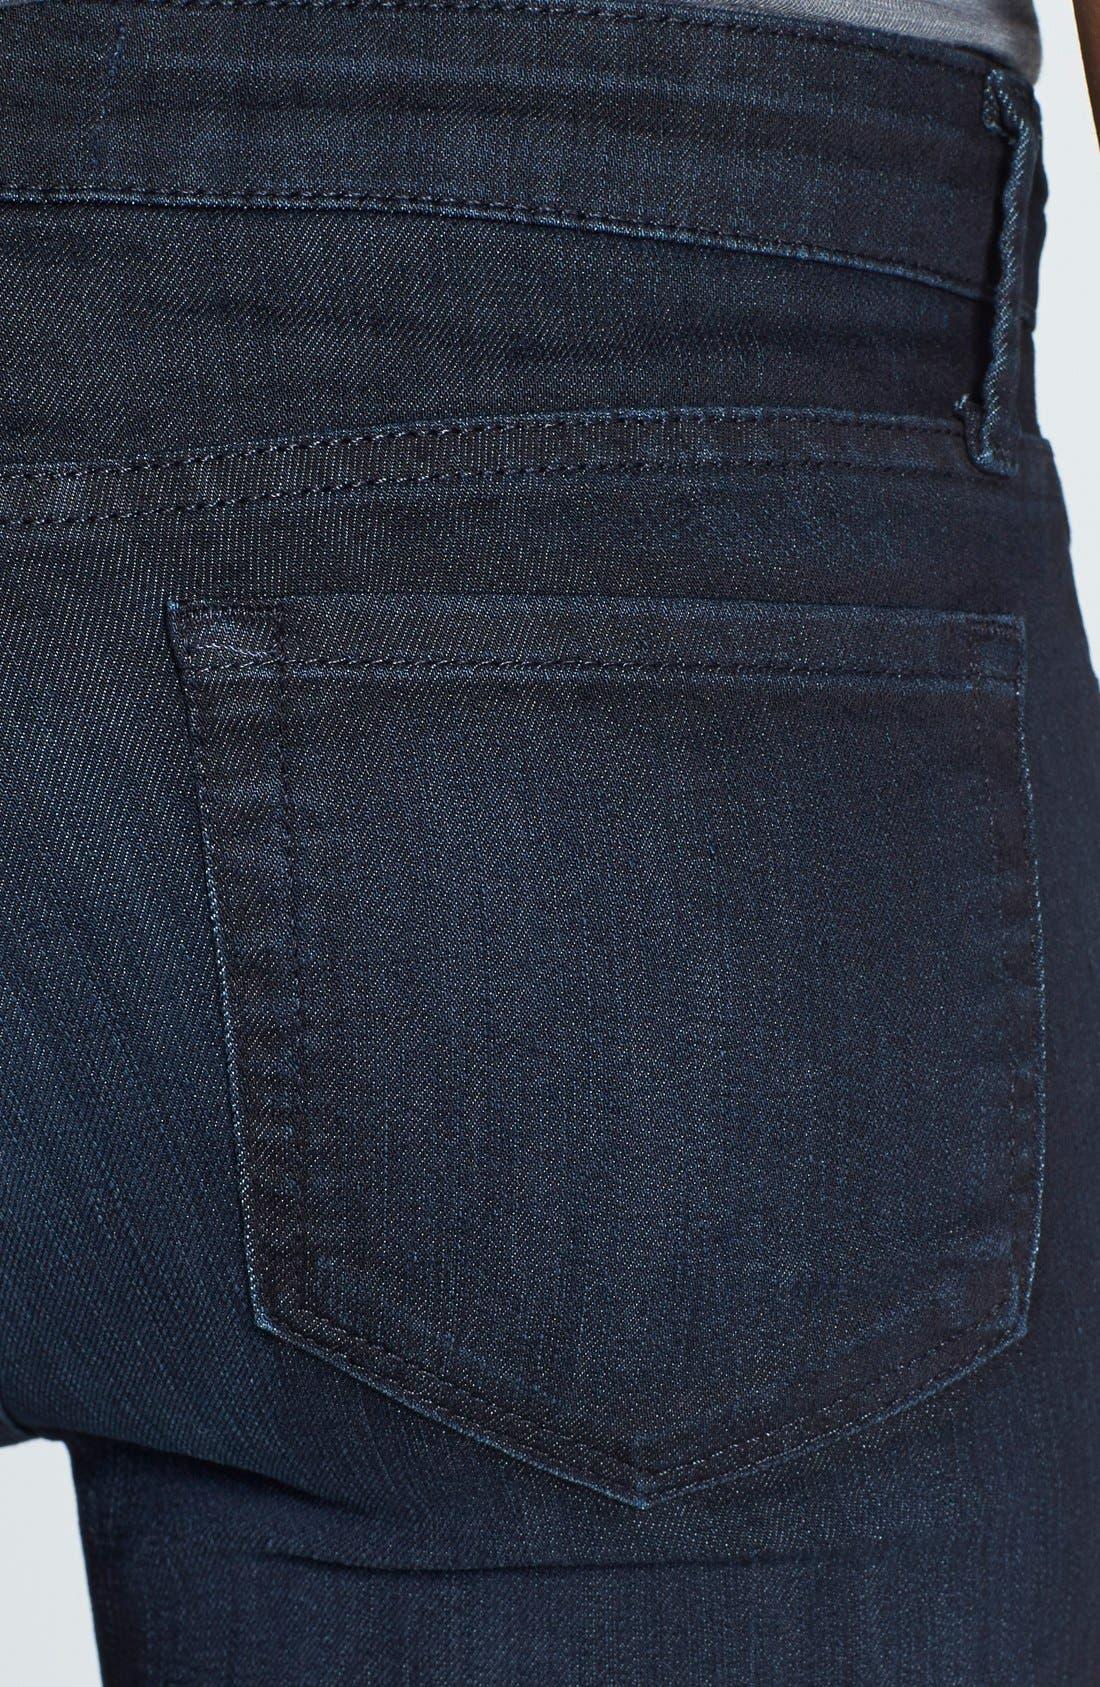 Low Rise Skinny Jeans,                             Alternate thumbnail 6, color,